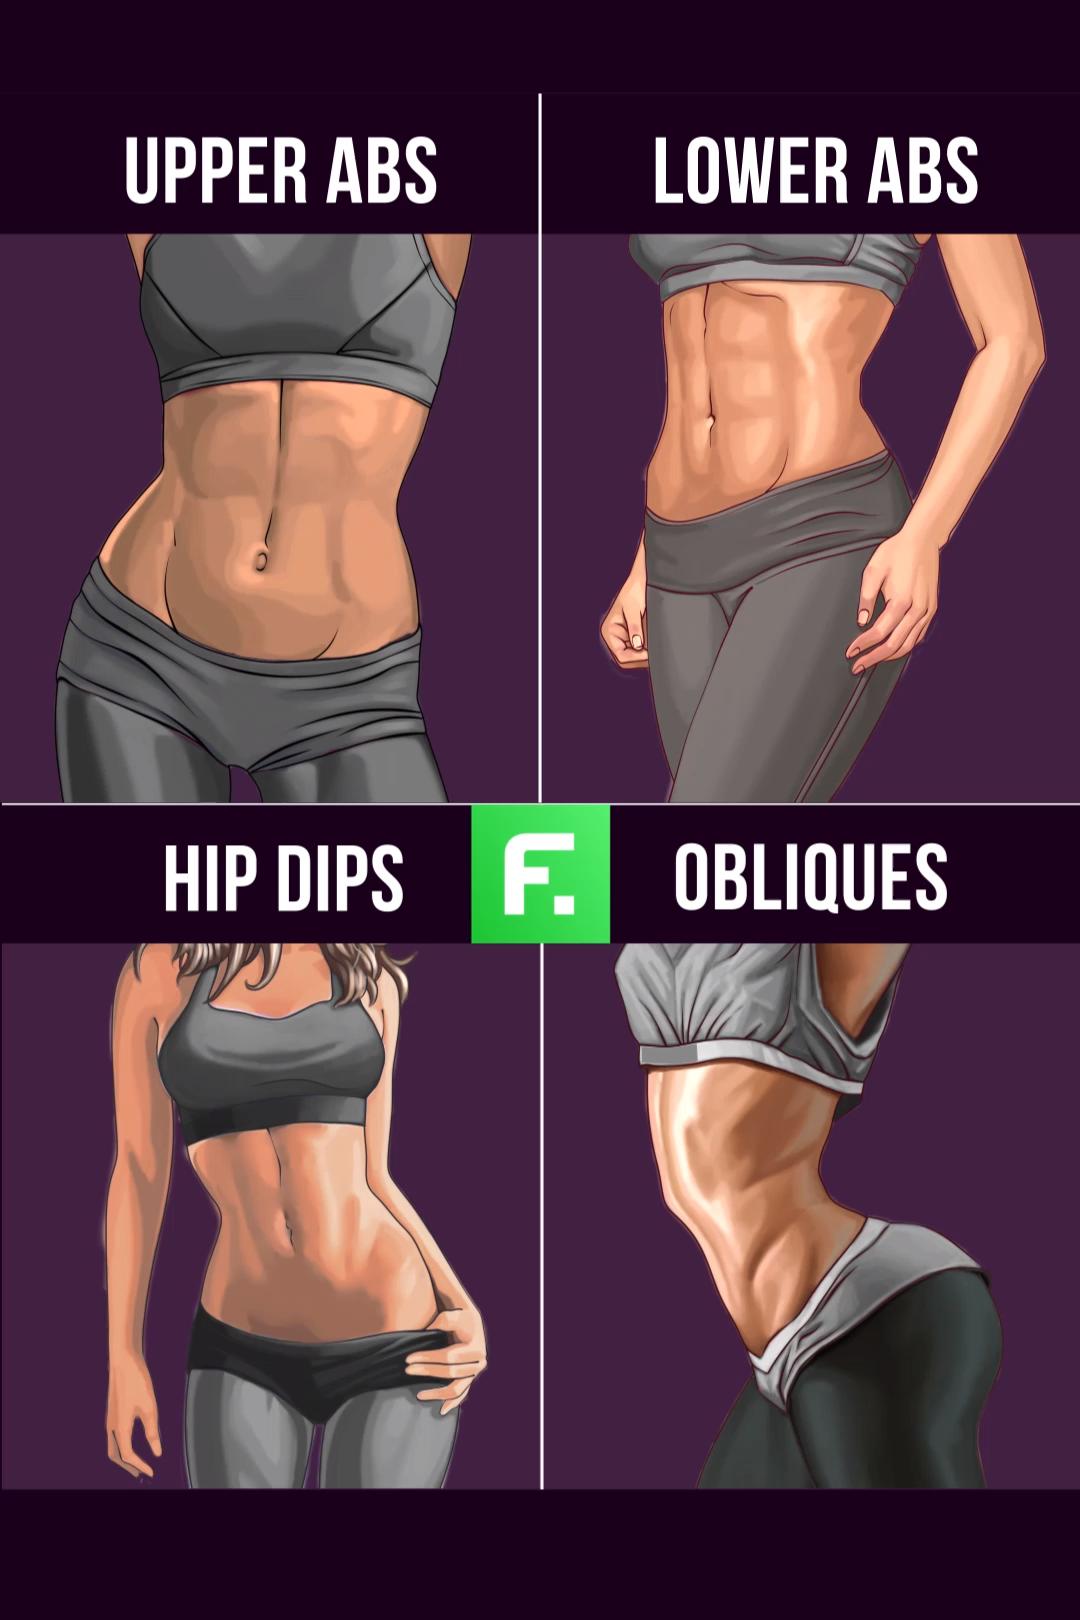 FC_883_244_EN_DAR_NE_2x3_PIN #fitnessexercisesathome